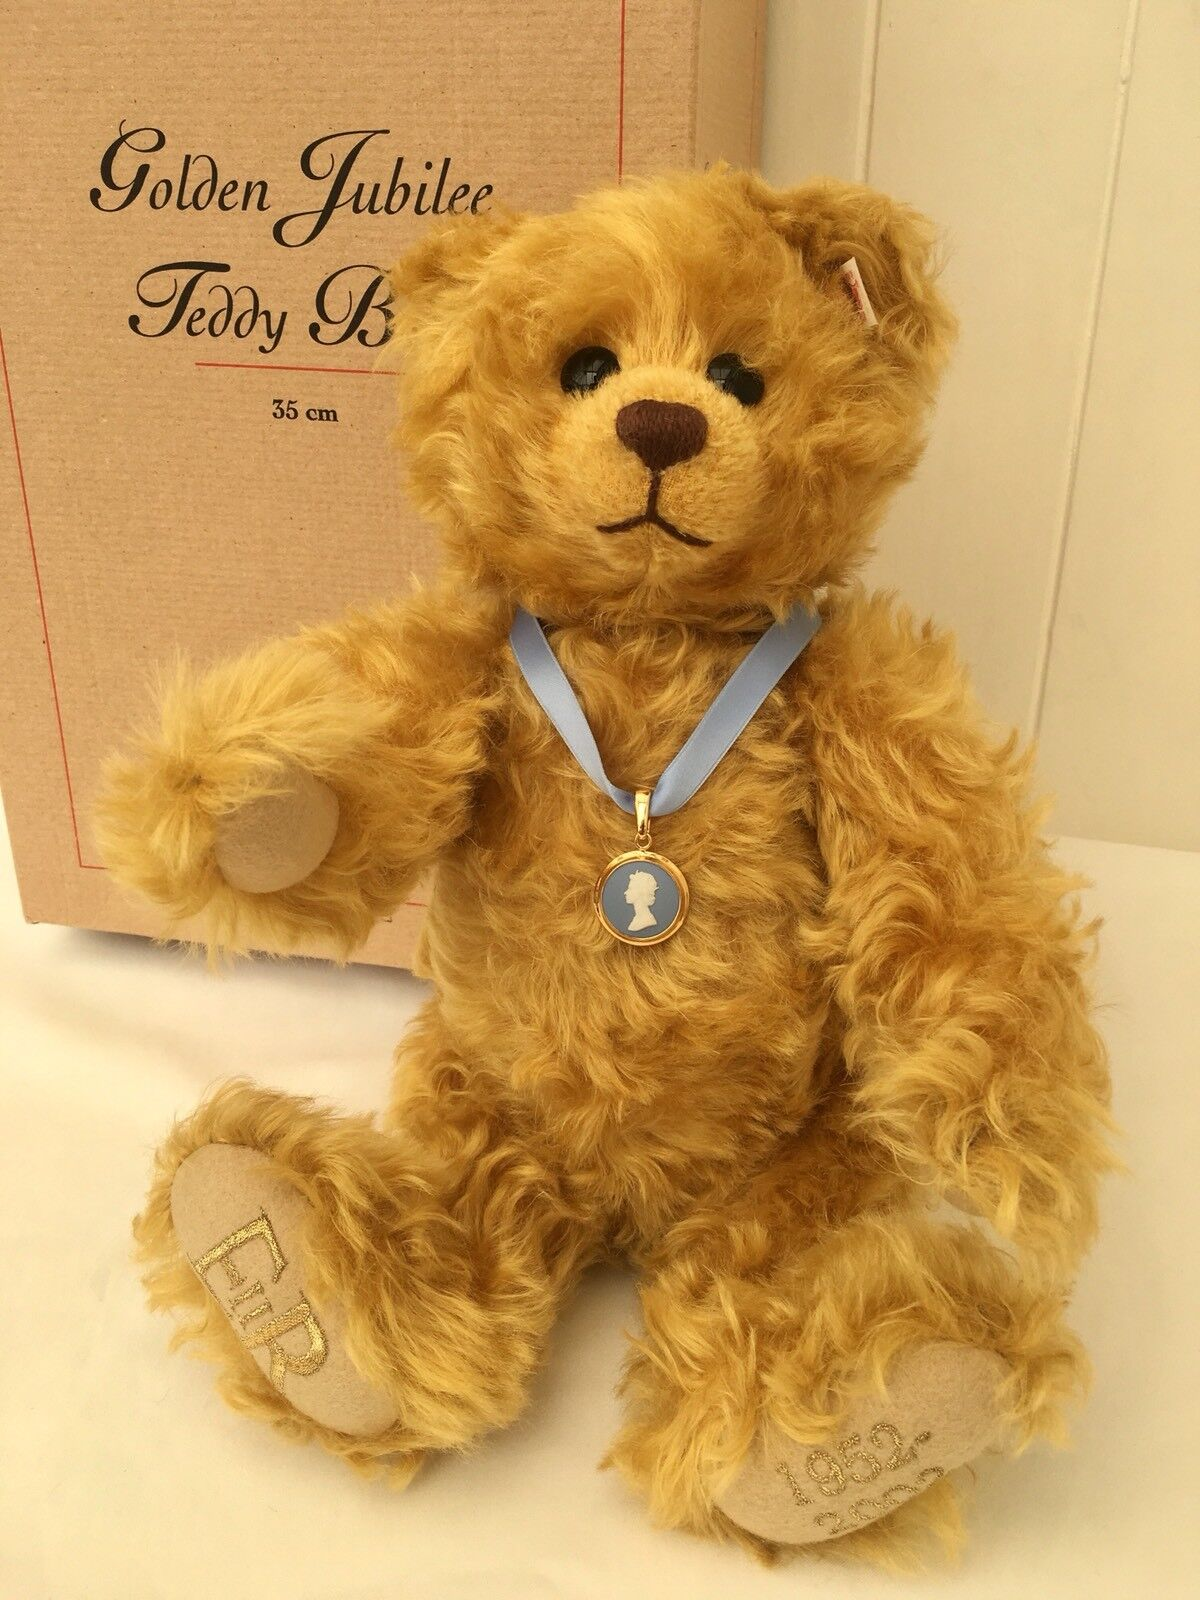 Steiff Golden Jubilee Teddy Bear - Ltd Edition - - - 2002 - Gold - 32cm -  660610 3a7397